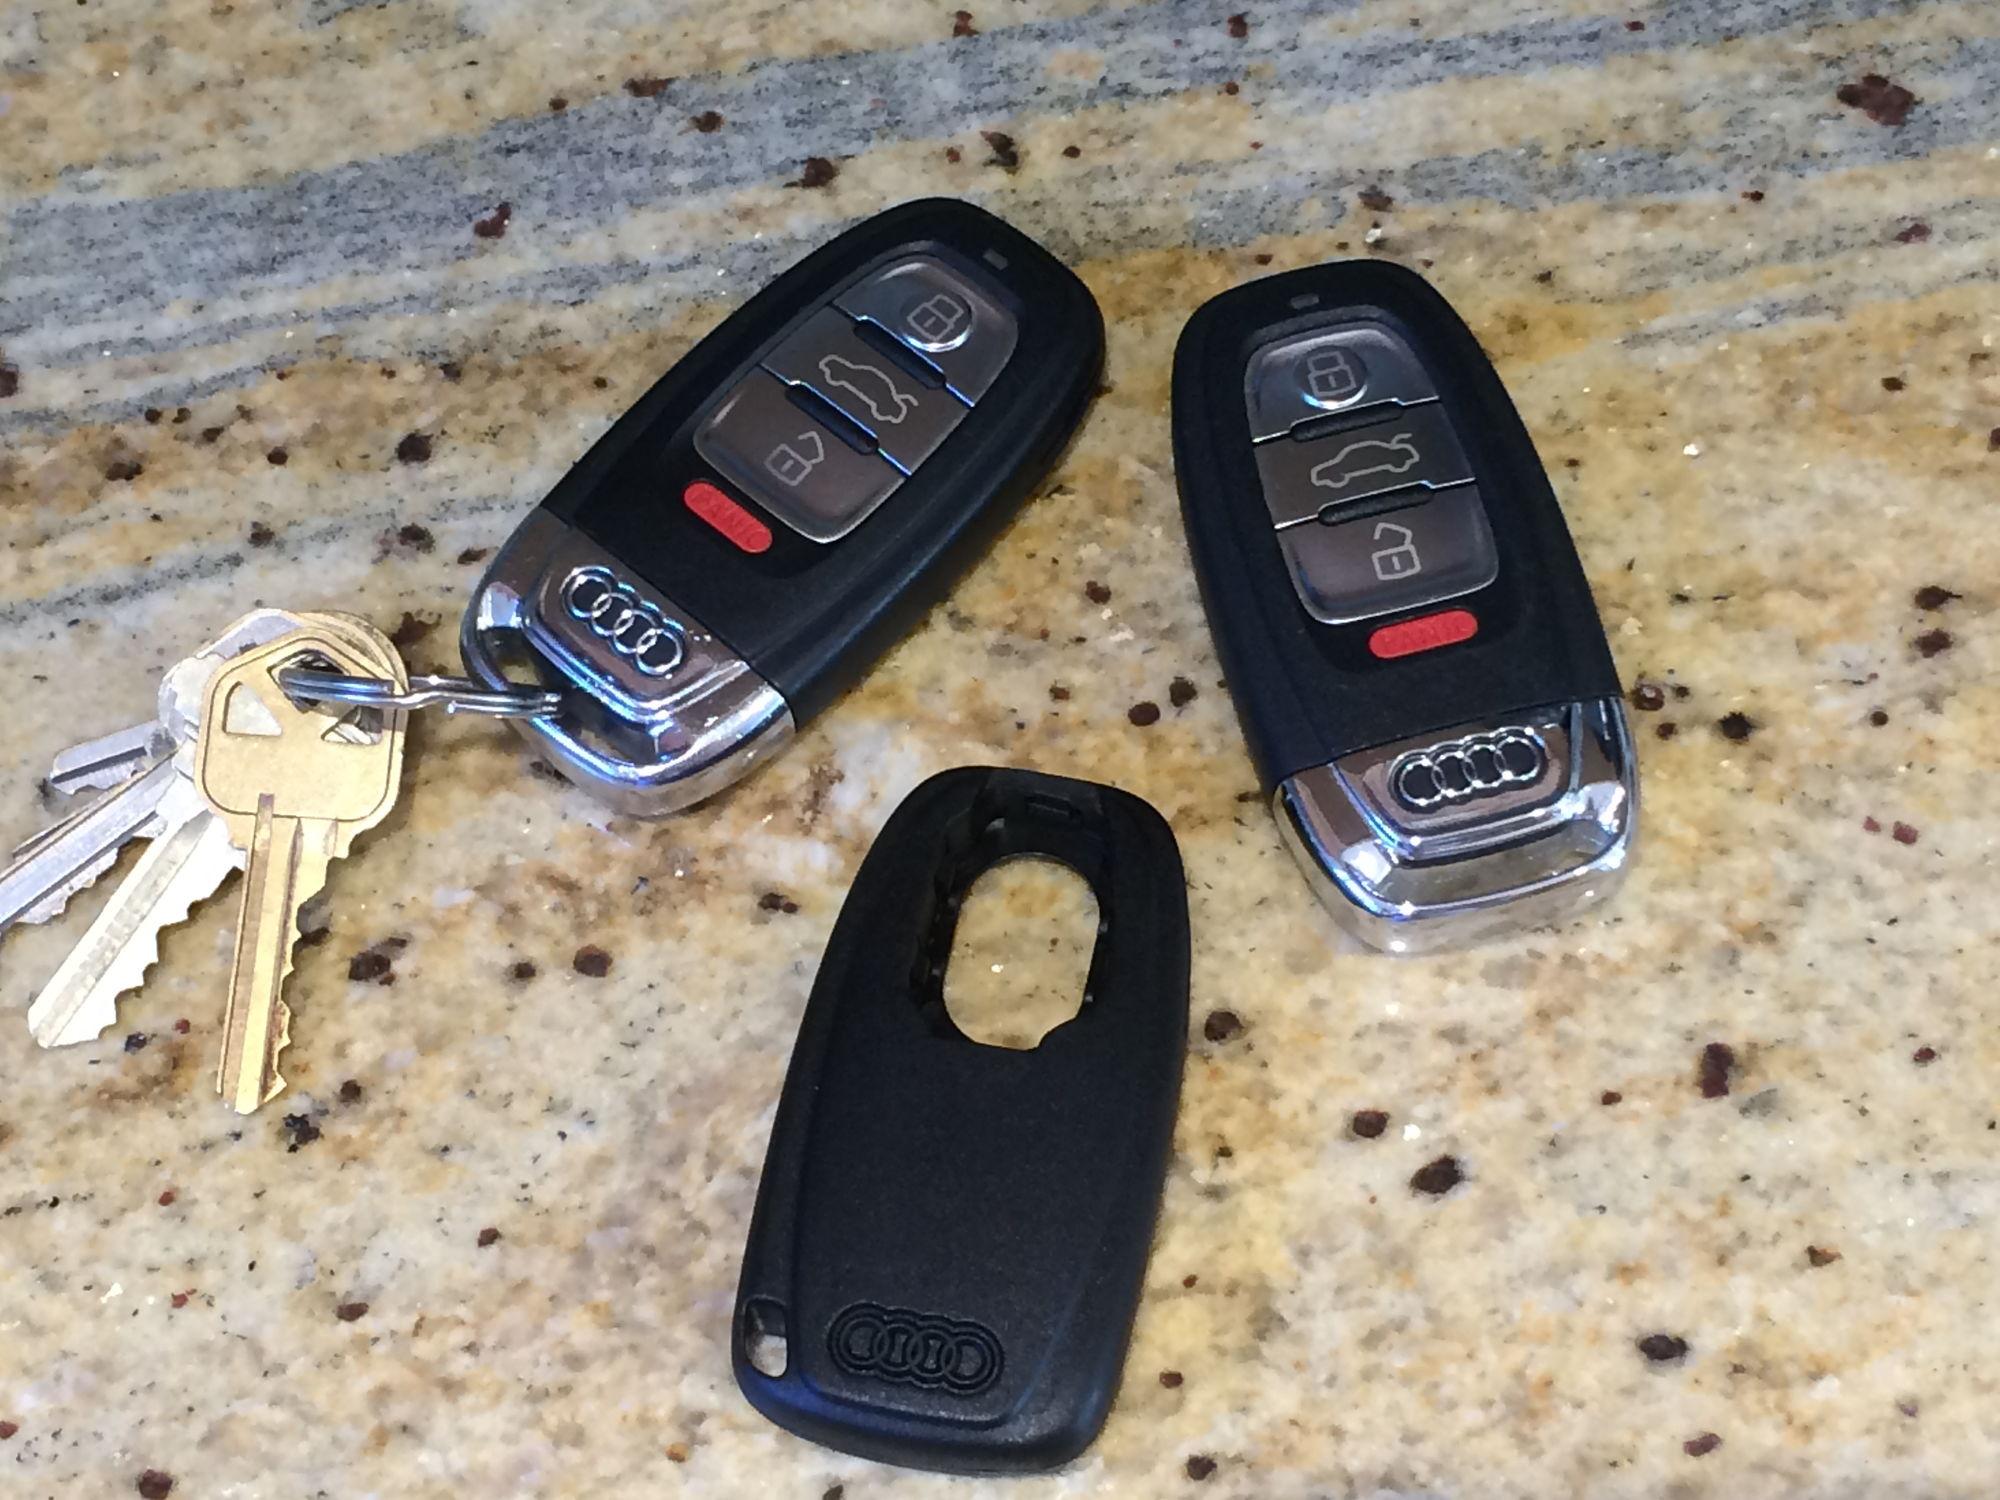 Mystery Gbox Key ??? - AudiWorld Forums on lexus is300 key, honda accord key, subaru wrx key, chevrolet spark key, lexus ls 430 key, mercedes c250 key, land rover lr3 key, bmw 1 series coupe key, mitsubishi outlander key, lexus es300 key, mitsubishi galant key, 2006 audi key, dodge challenger key, audi s3 key, audi allroad key, porsche boxter key, mercedes c230 key, bmw 528i key, porsche 928 key, audi cabriolet key,